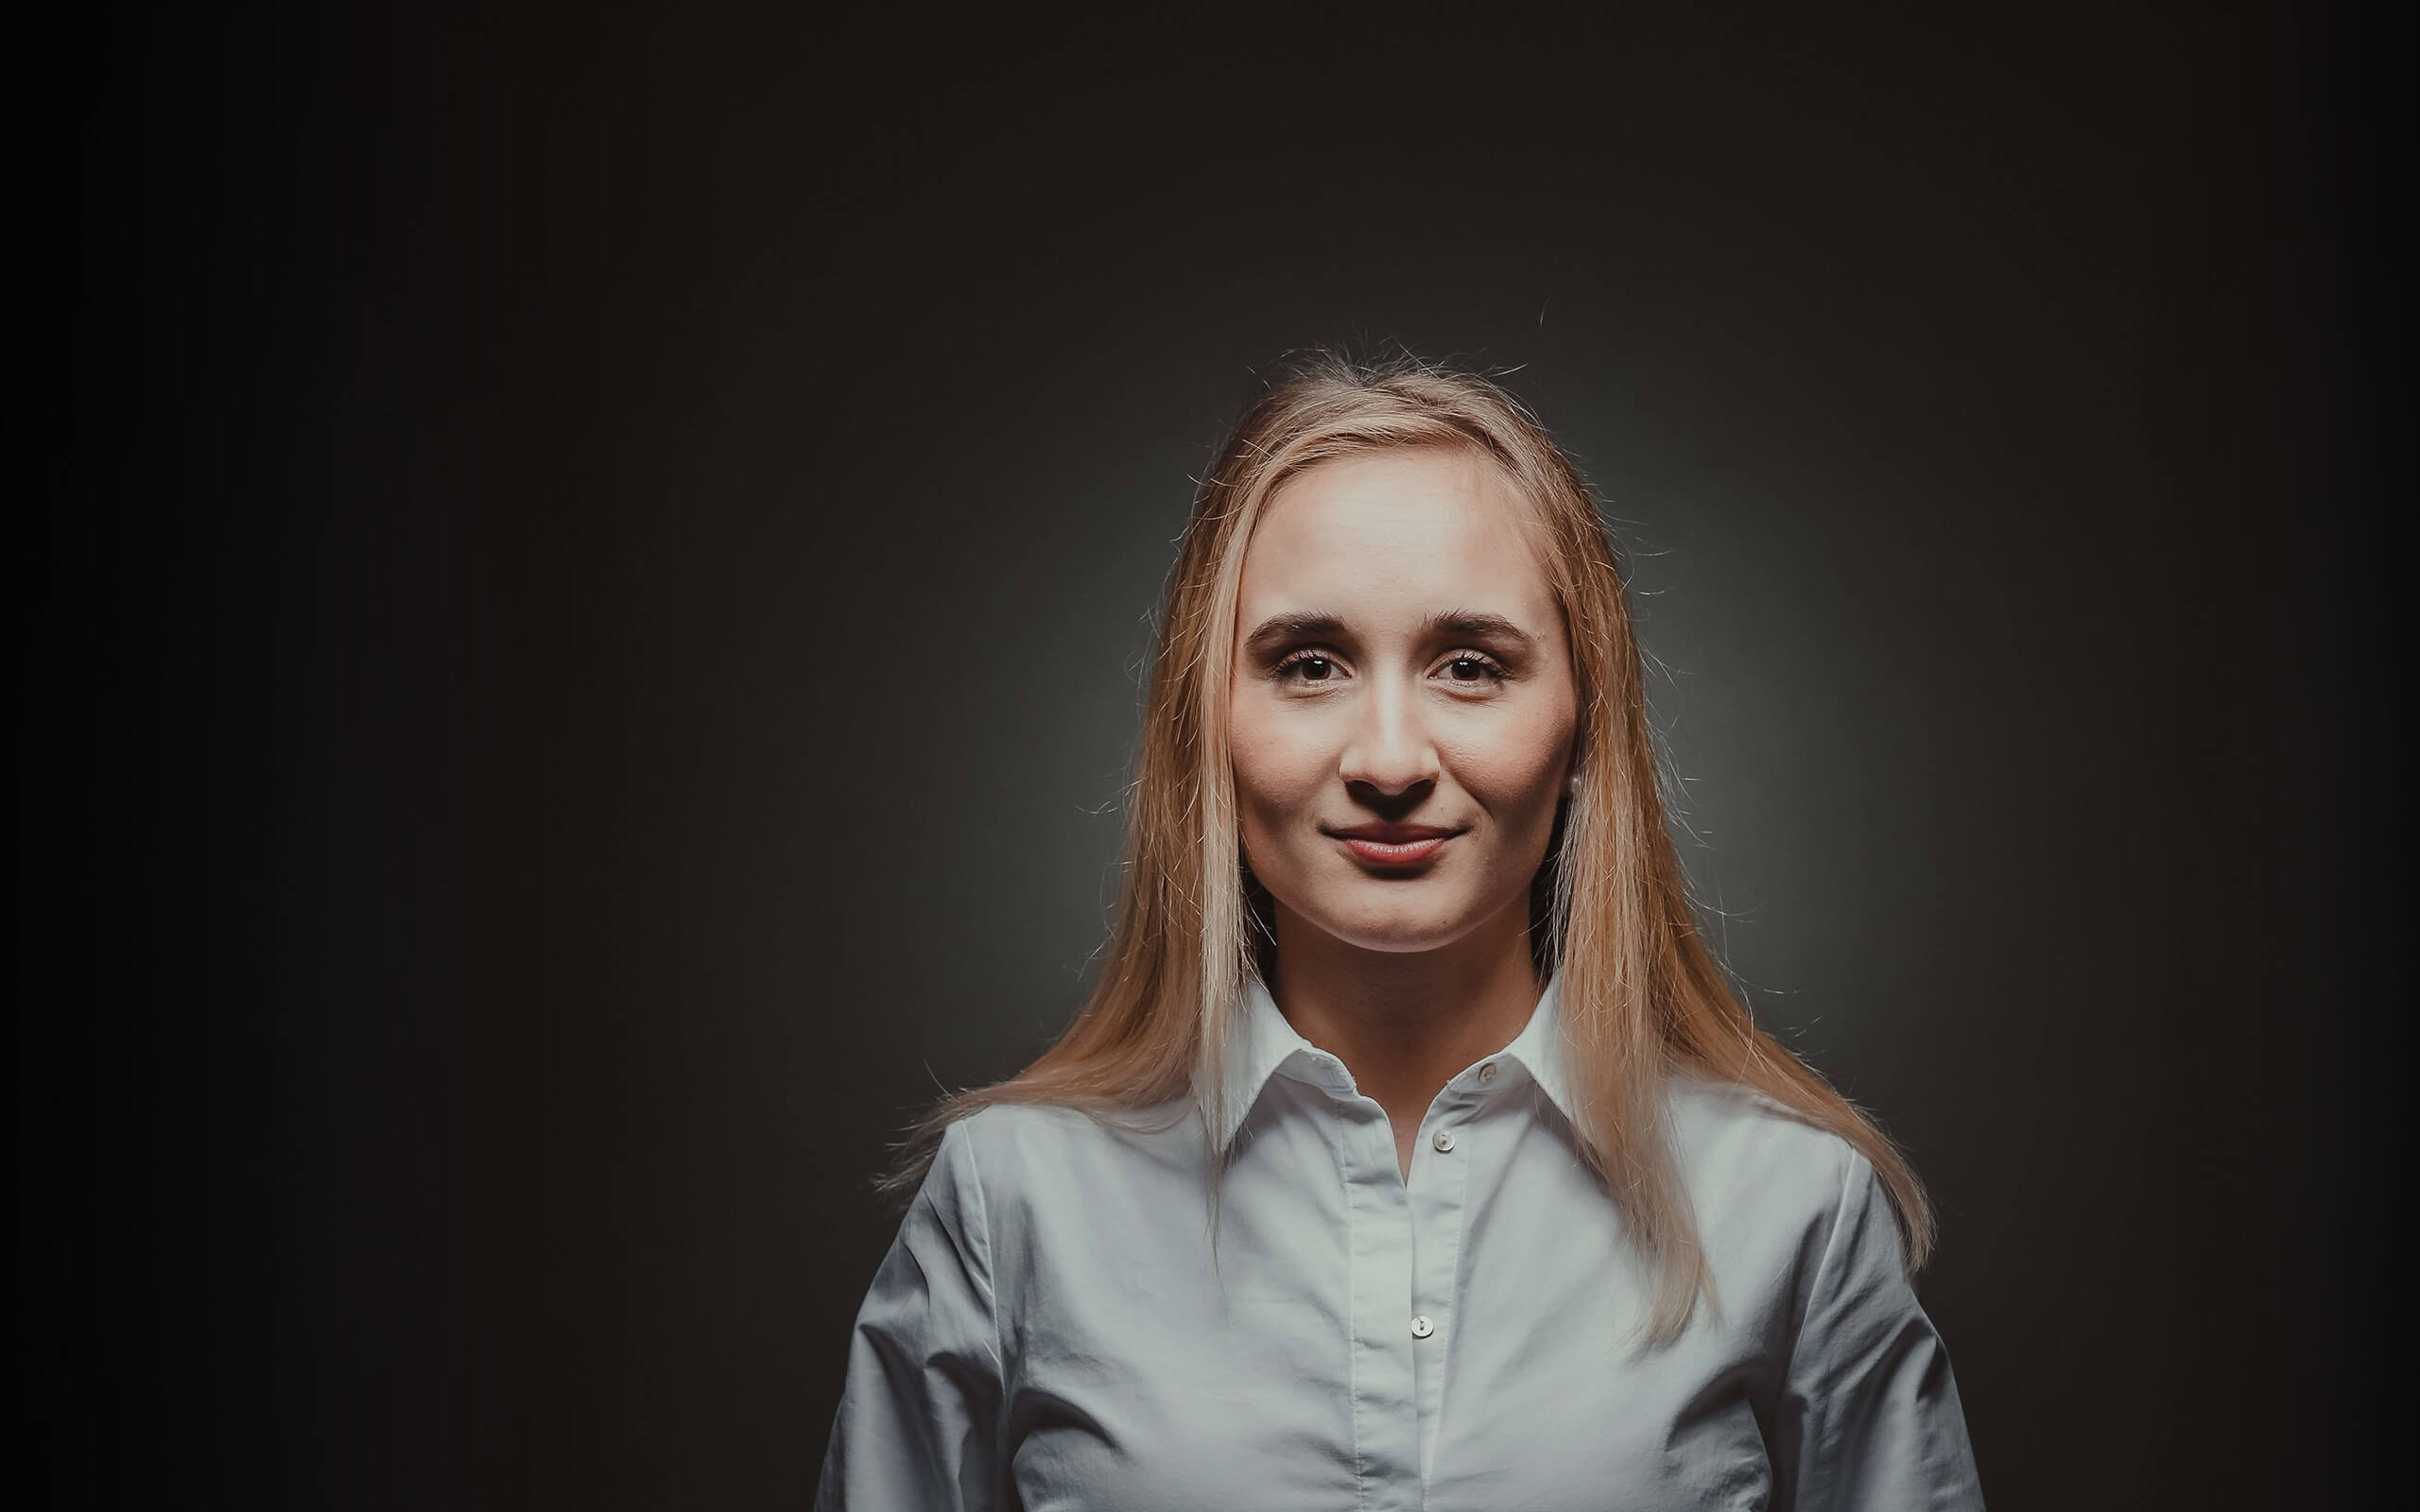 Barbora Horackova